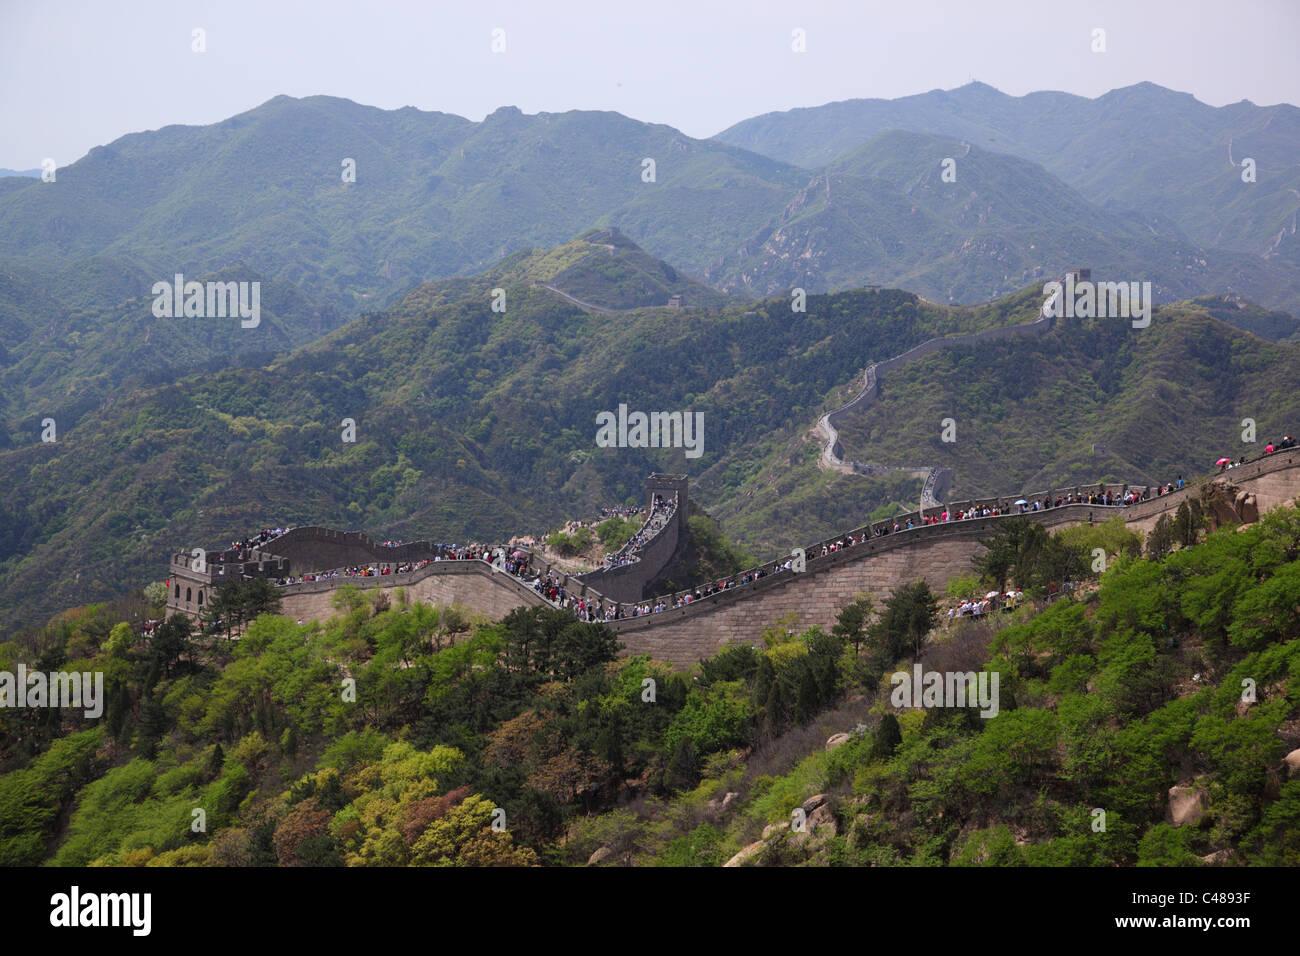 Grande Muraille de Chine, Beijing, Chine Photo Stock